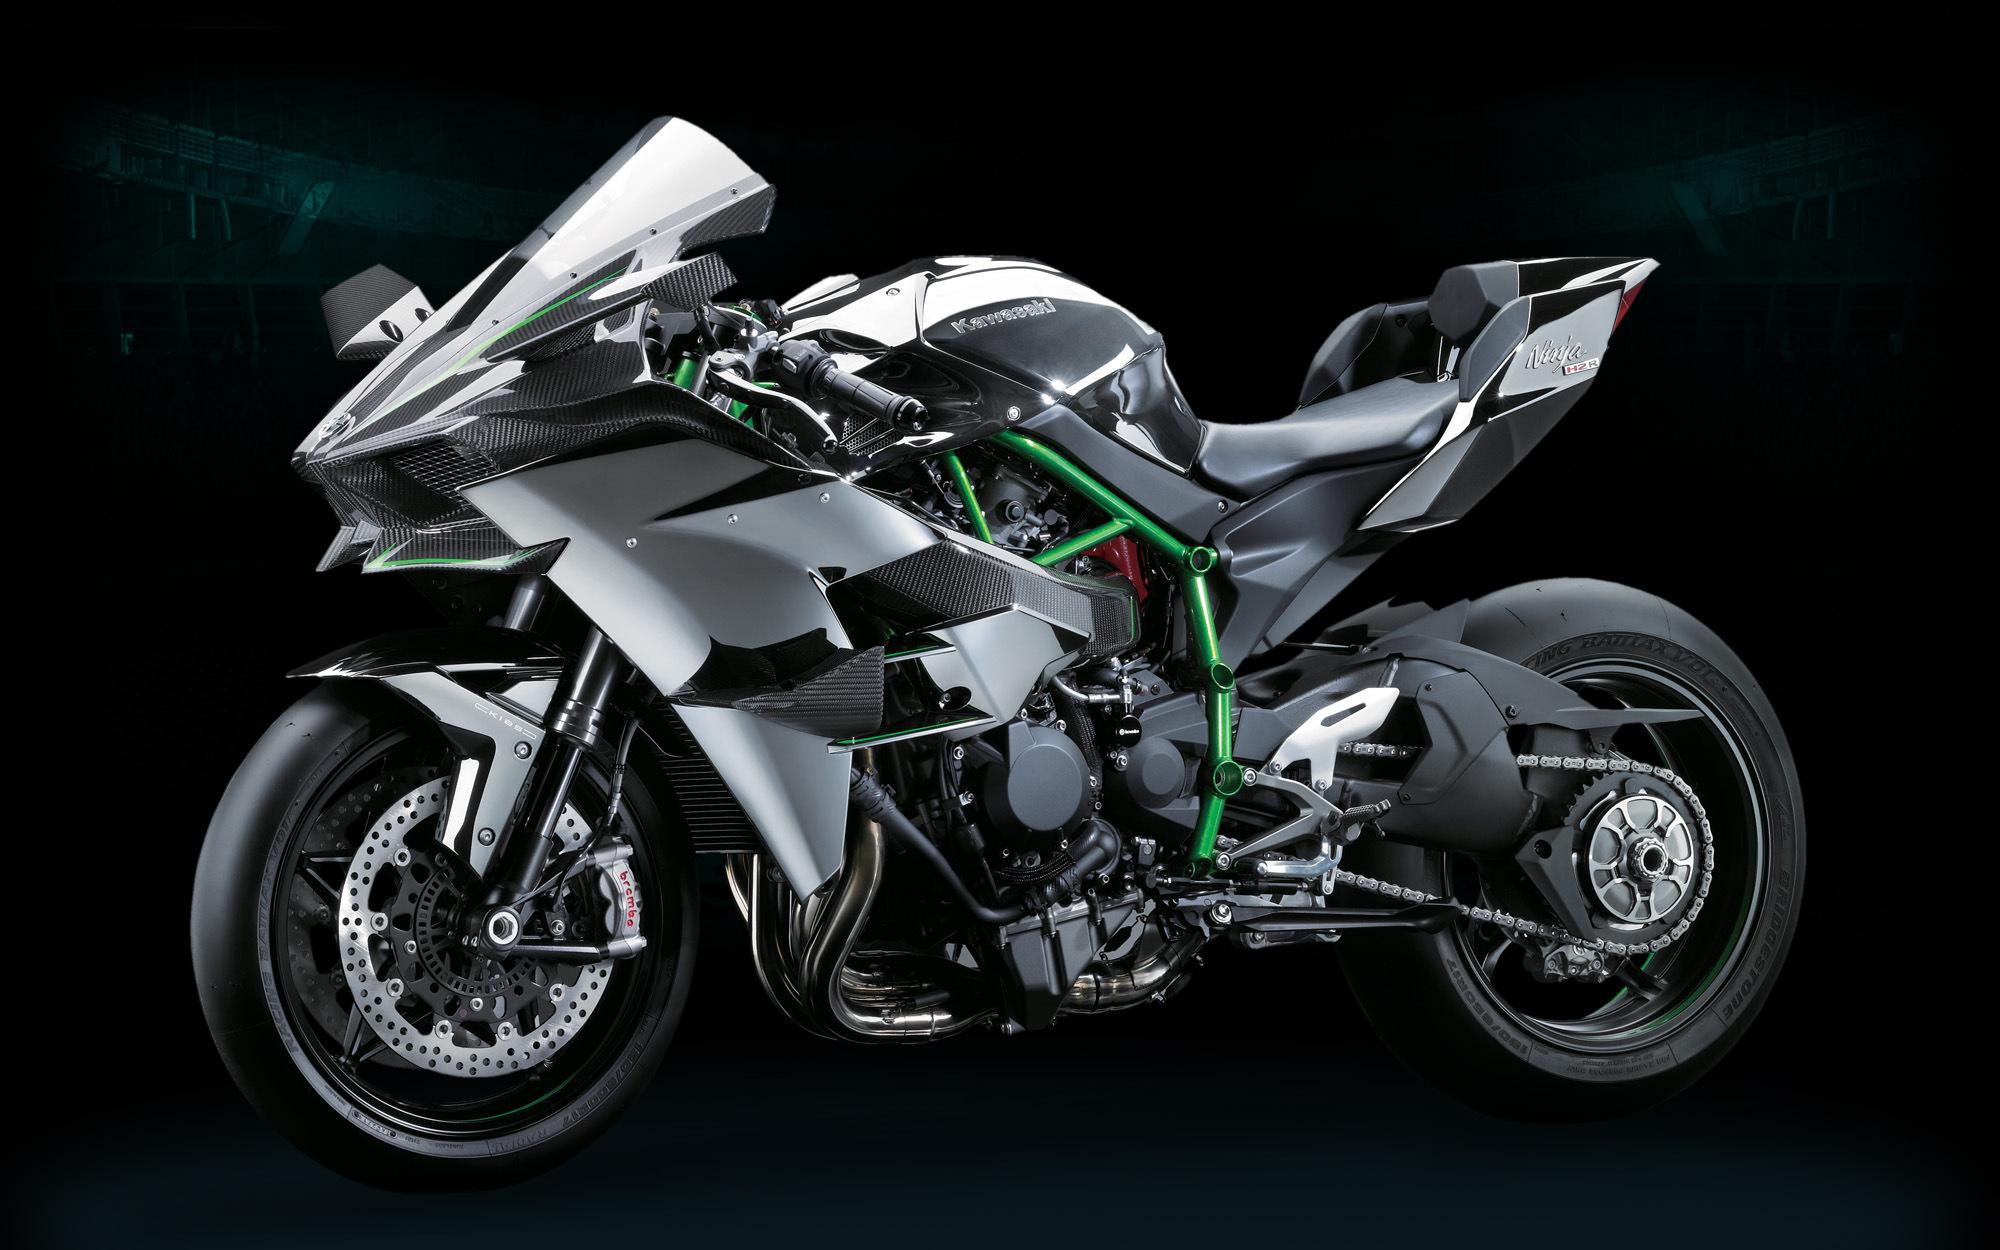 More Kawasaki Ninja H2s coming to the UK